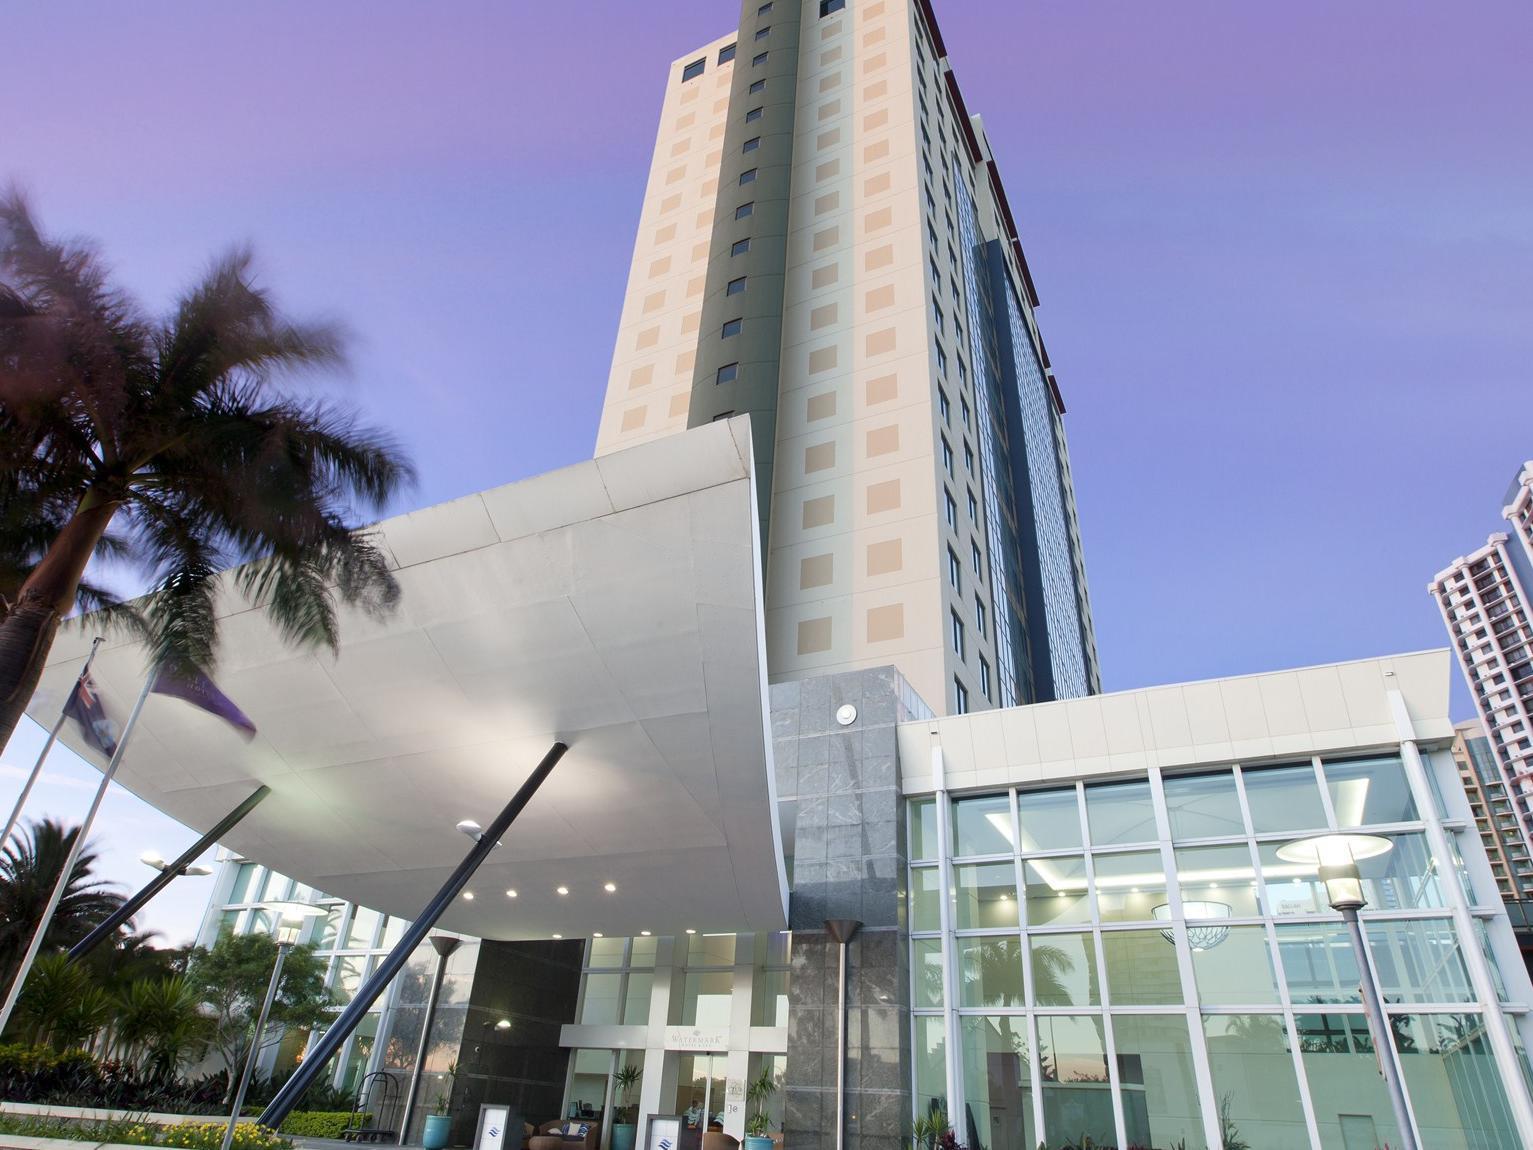 Club Watermark Hotel - Hotell och Boende i Australien , Guldkusten